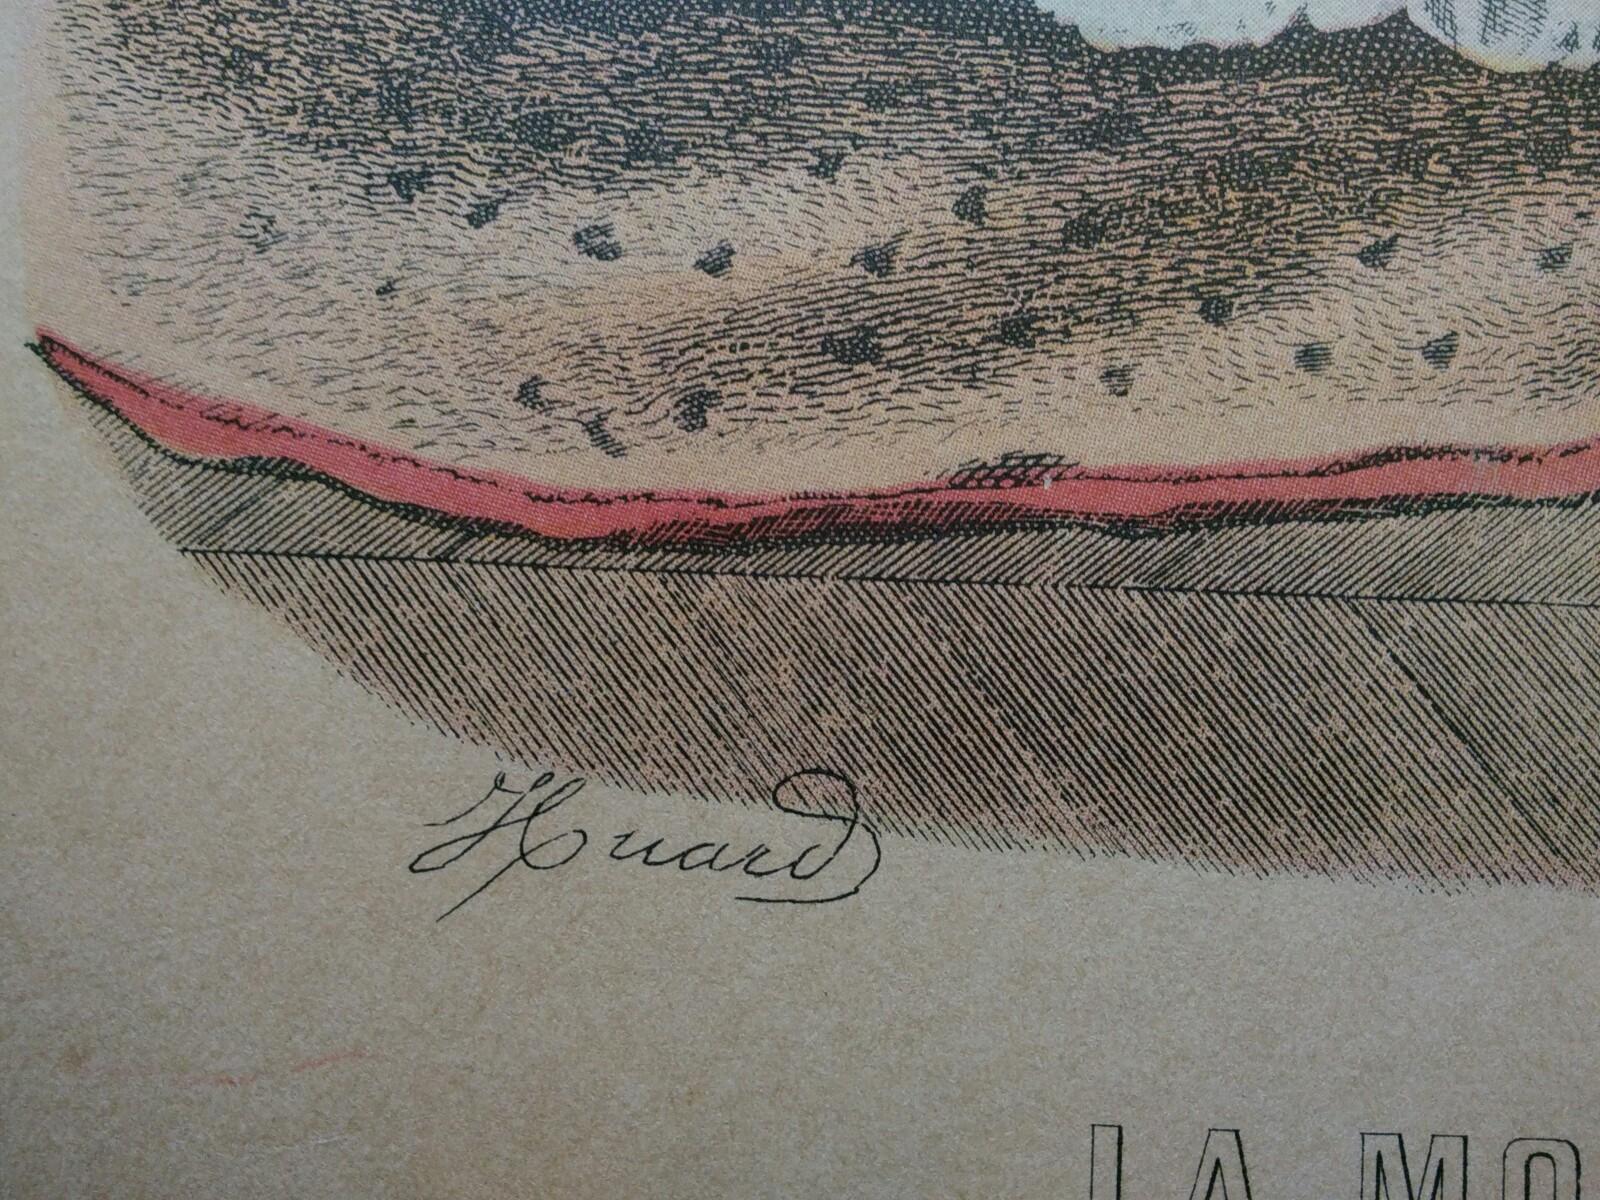 I have a question regarding an antique scrapbook photo album journal